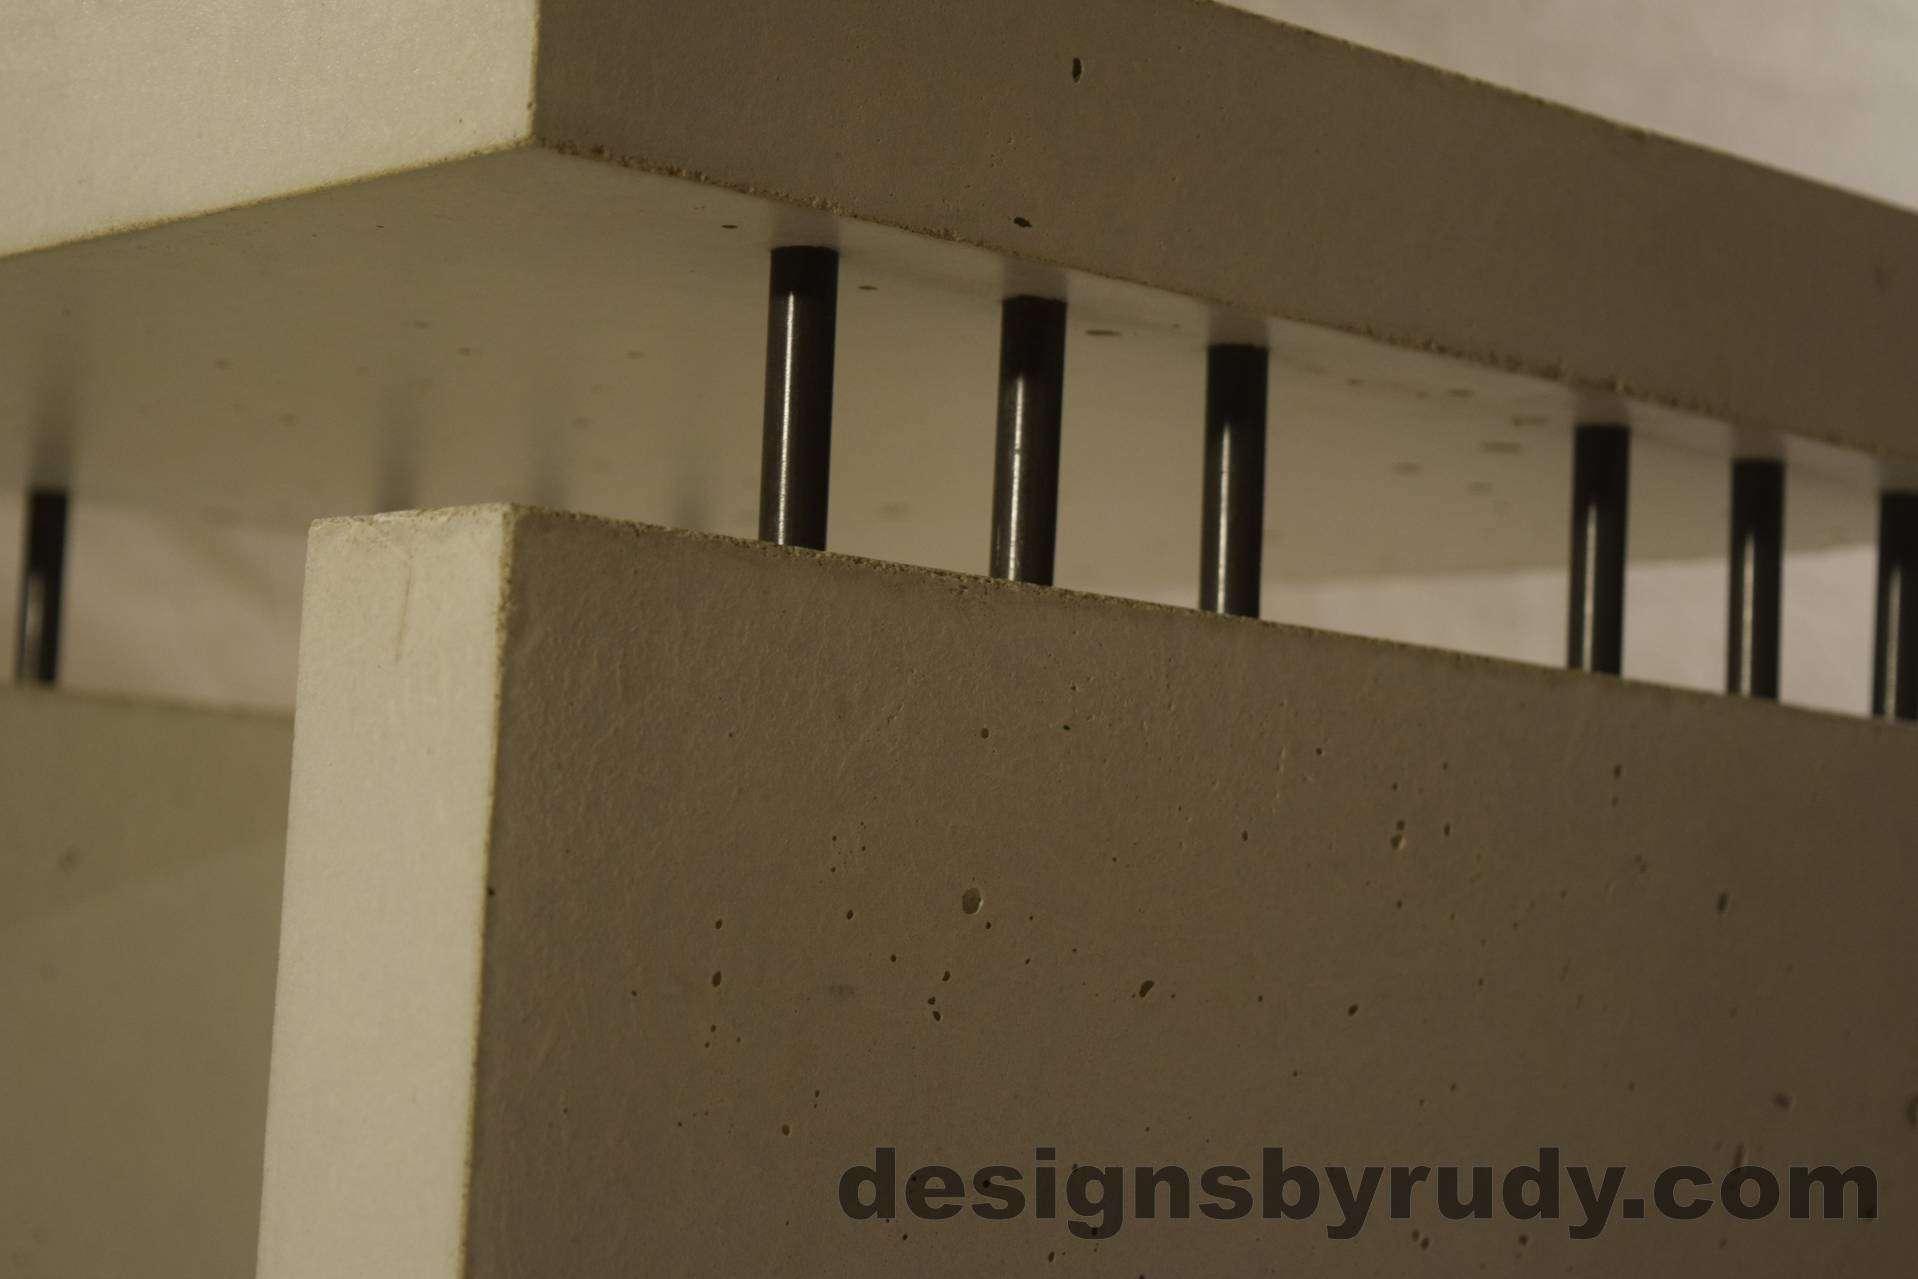 11L White Concrete Side Table DR0 interior lighting, top corner closeup 3, no flash, Designs by Rudy